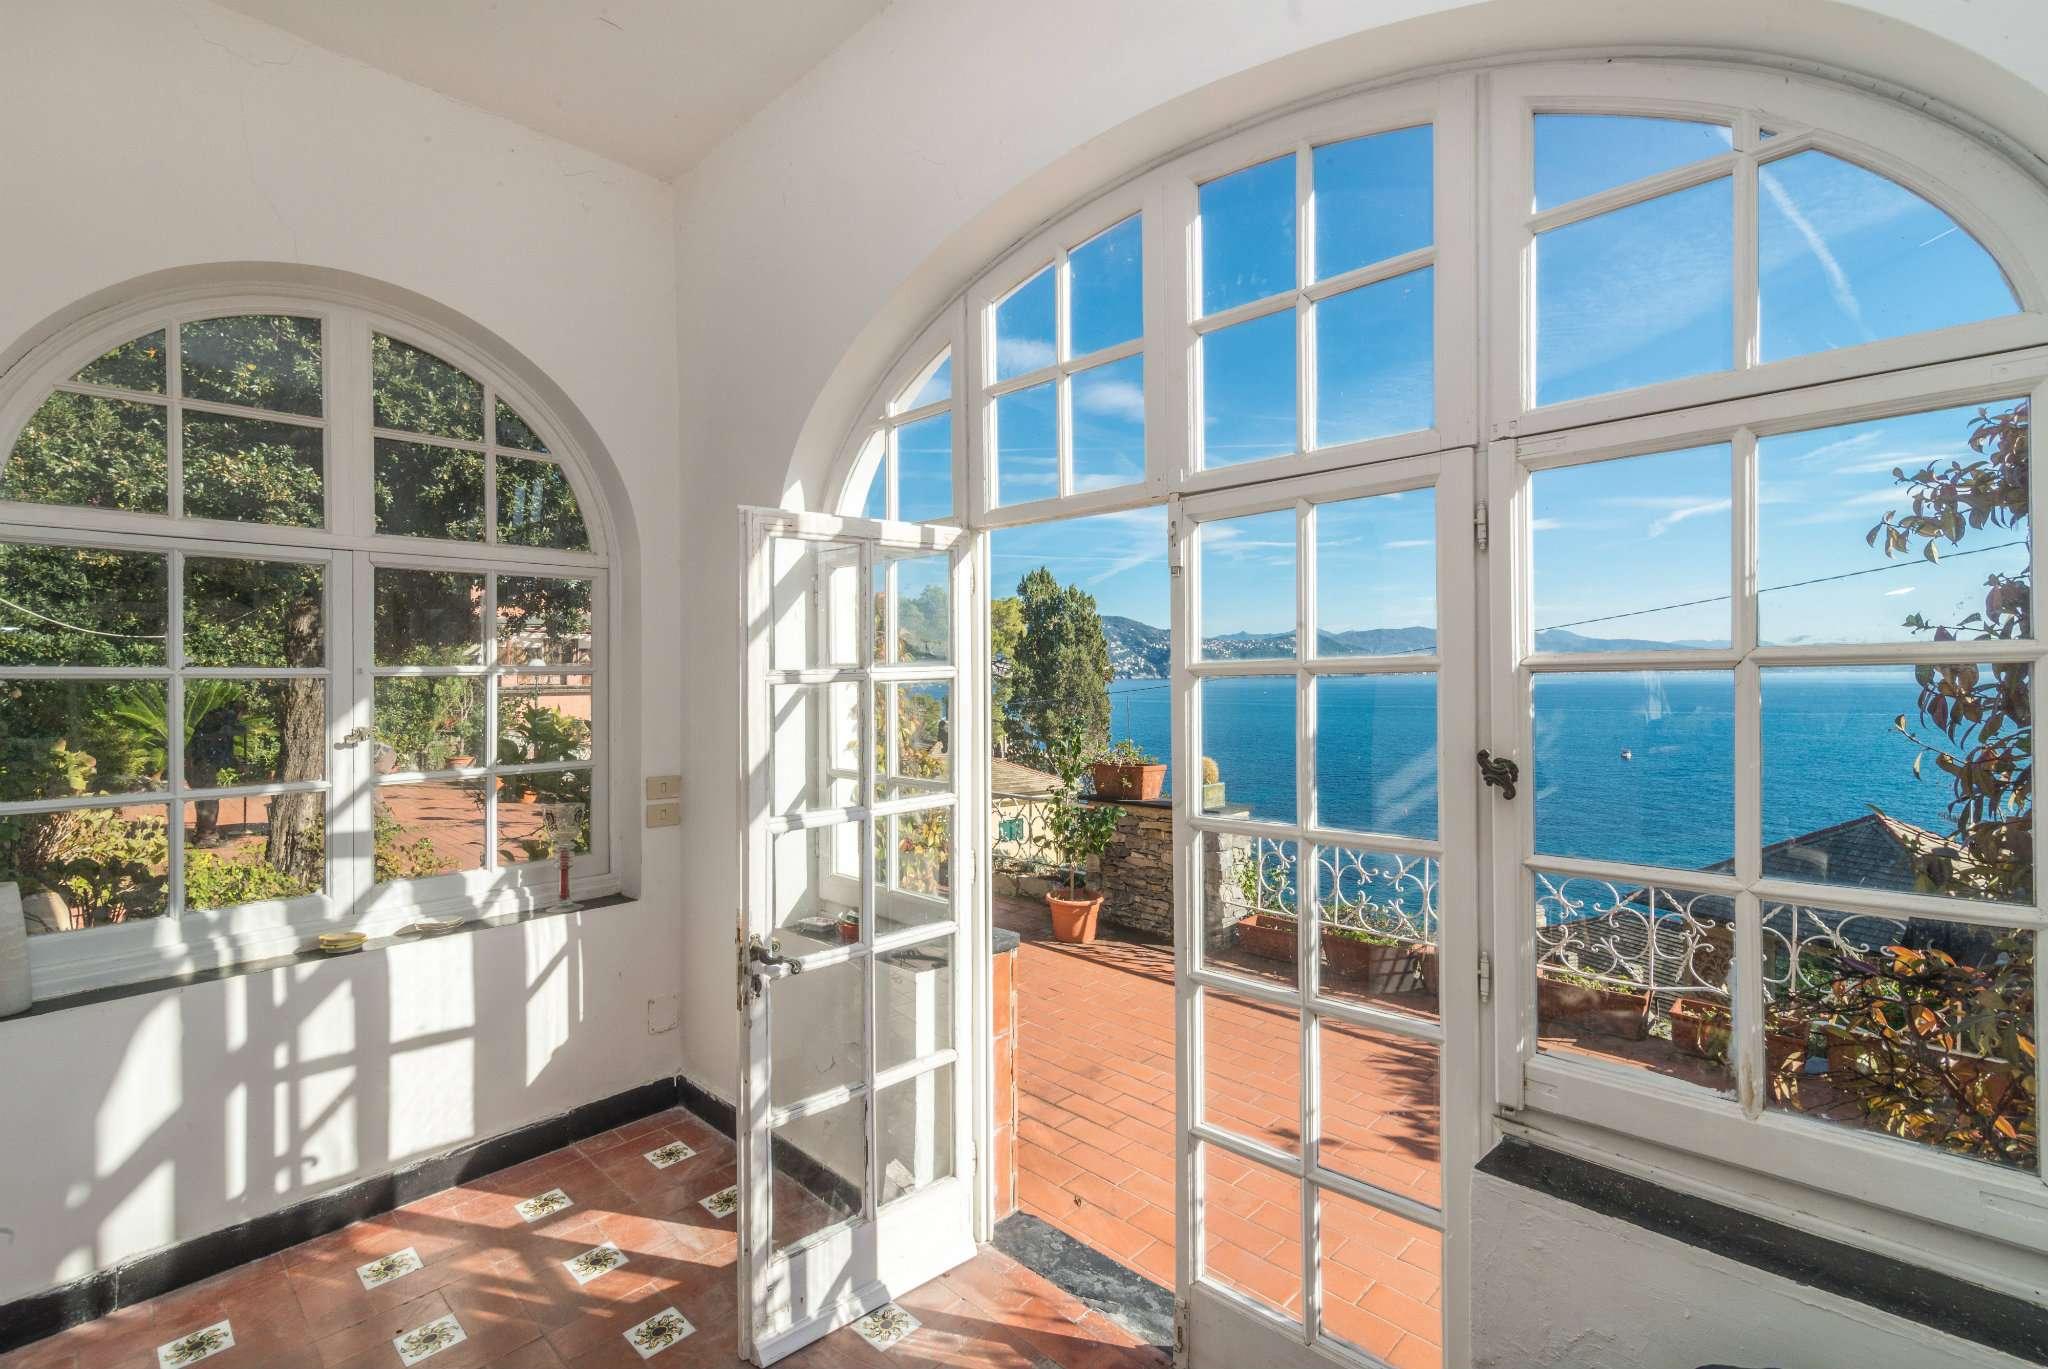 Villa in Vendita a Santa Margherita Ligure: 5 locali, 545 mq - Foto 2